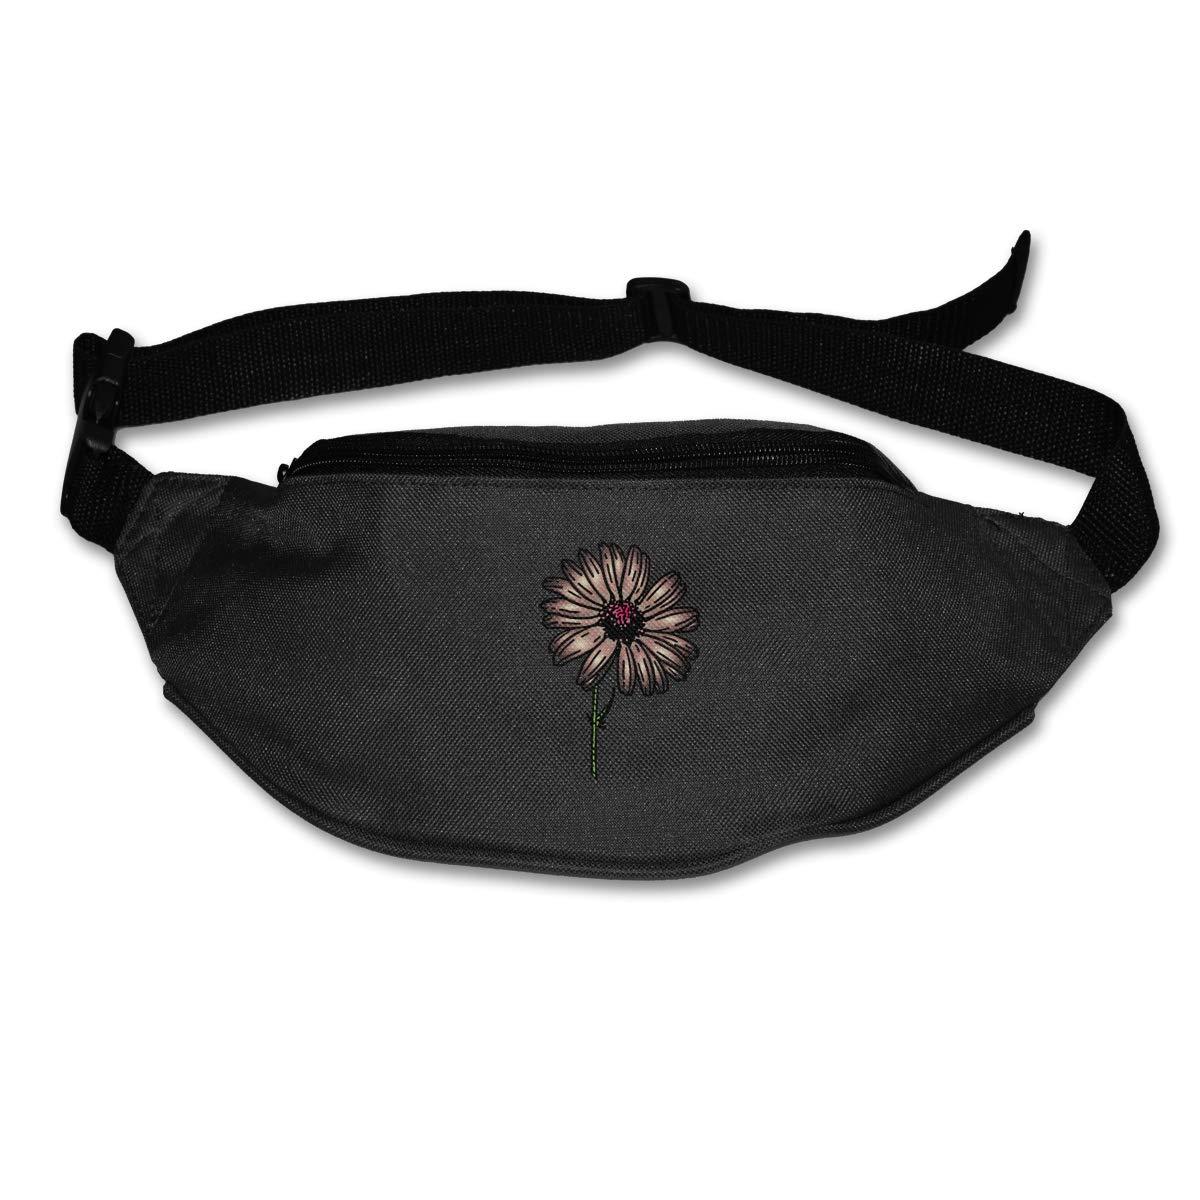 Pretty Daisy Sport Waist Bag Fanny Pack Adjustable For Hike